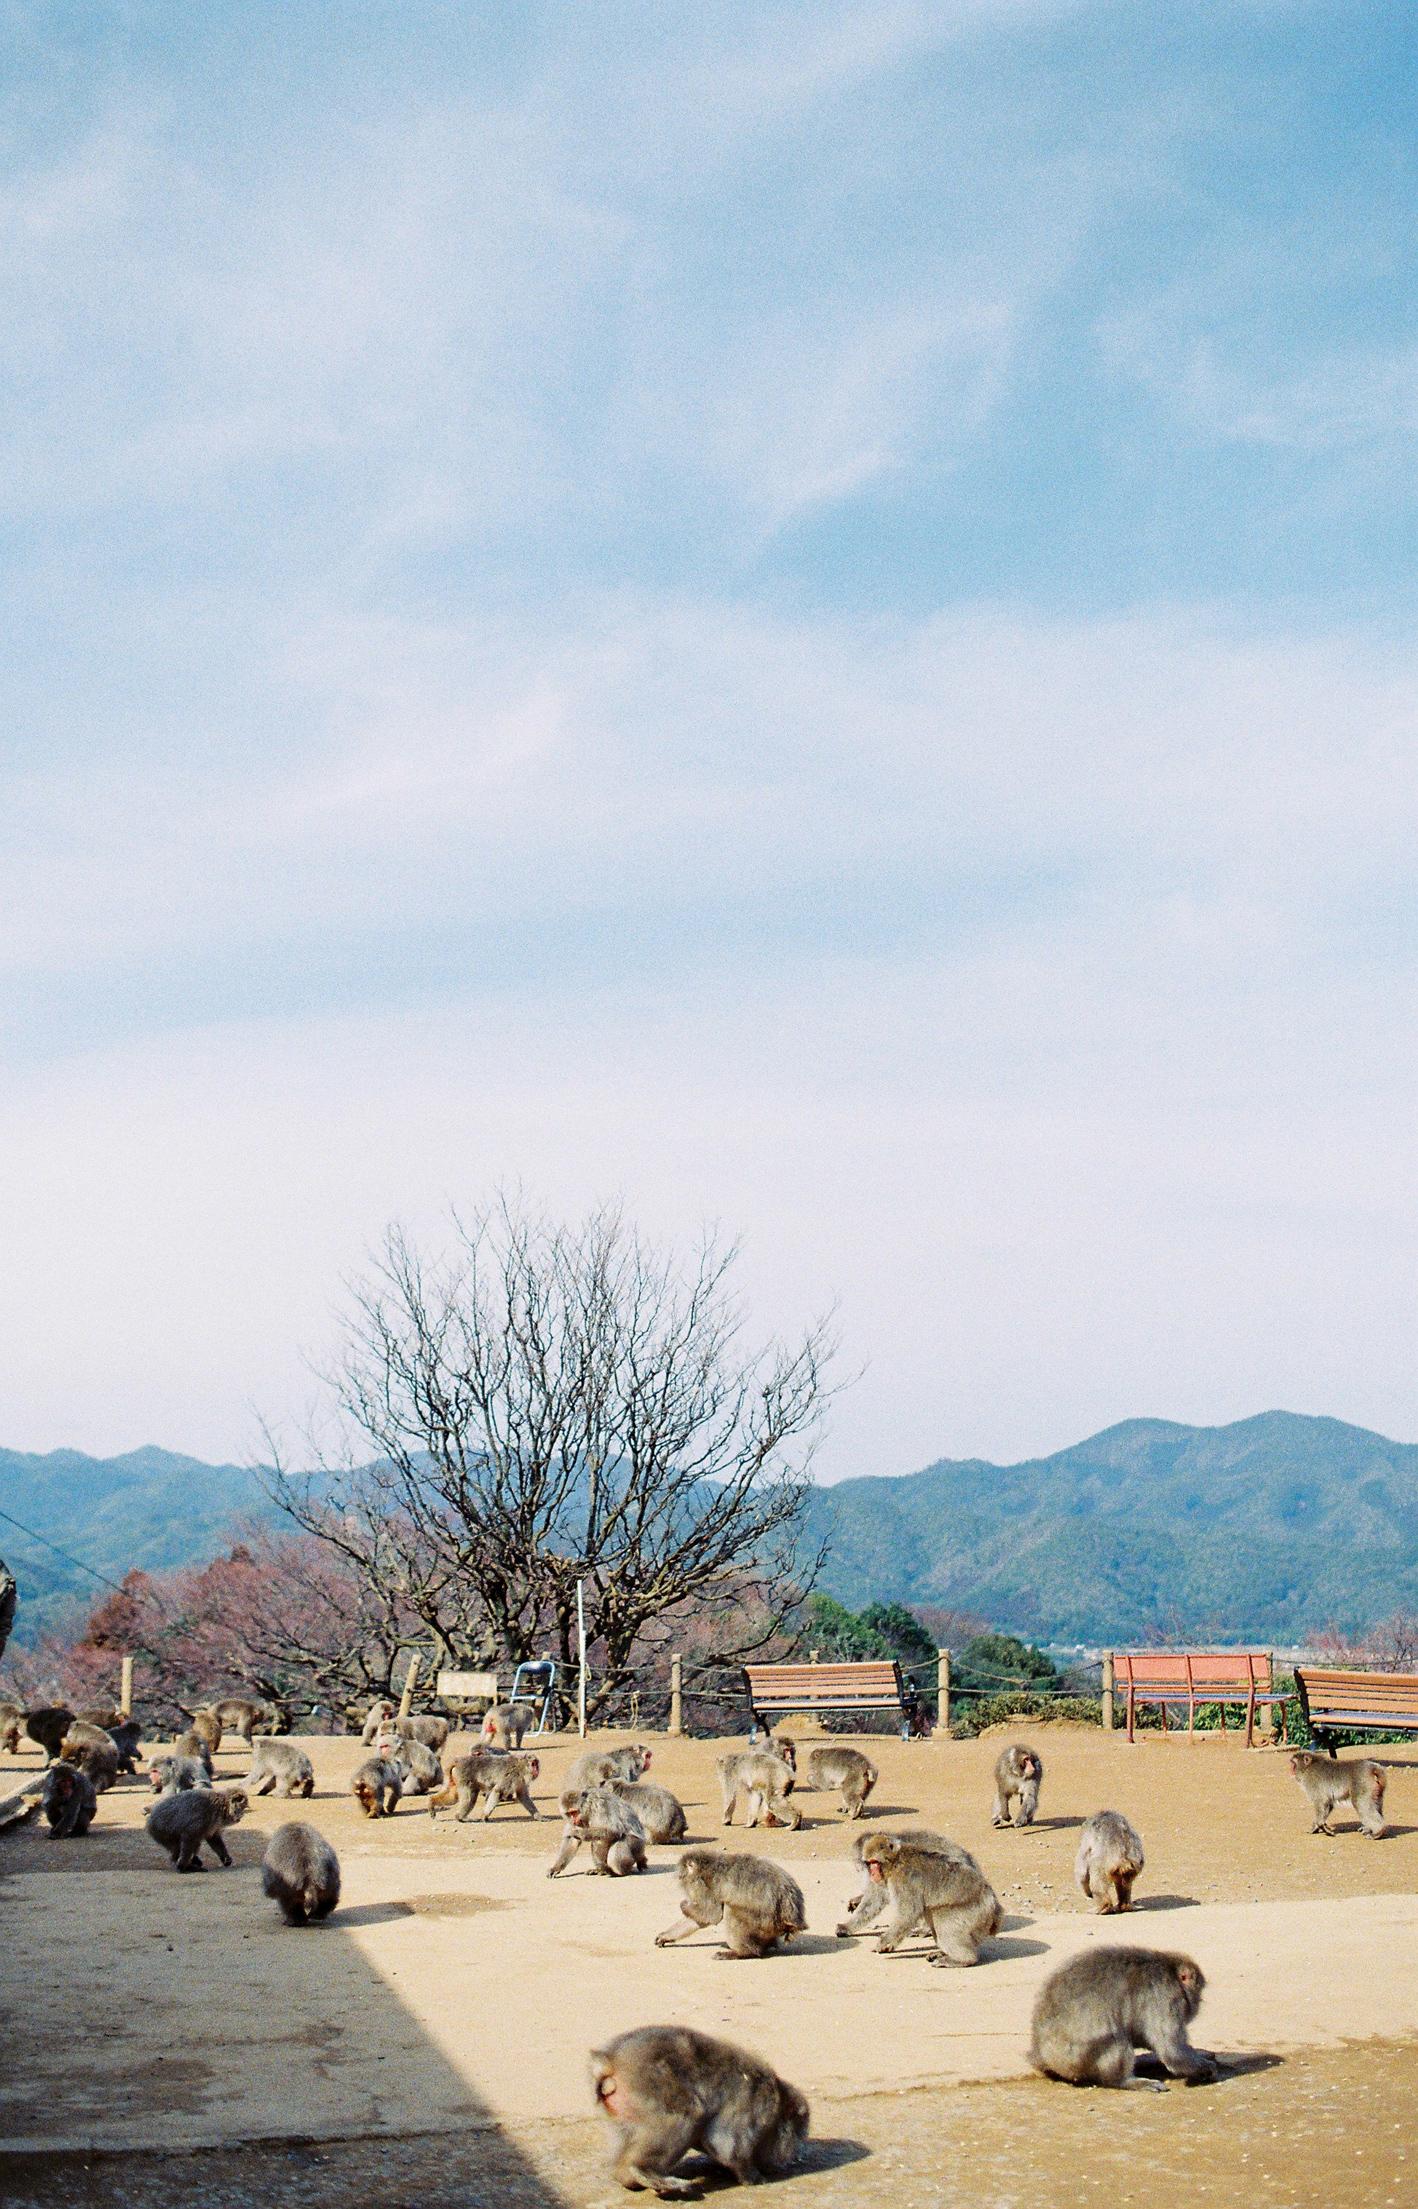 005-kyoto-arashiyama-sophie-baker-photography